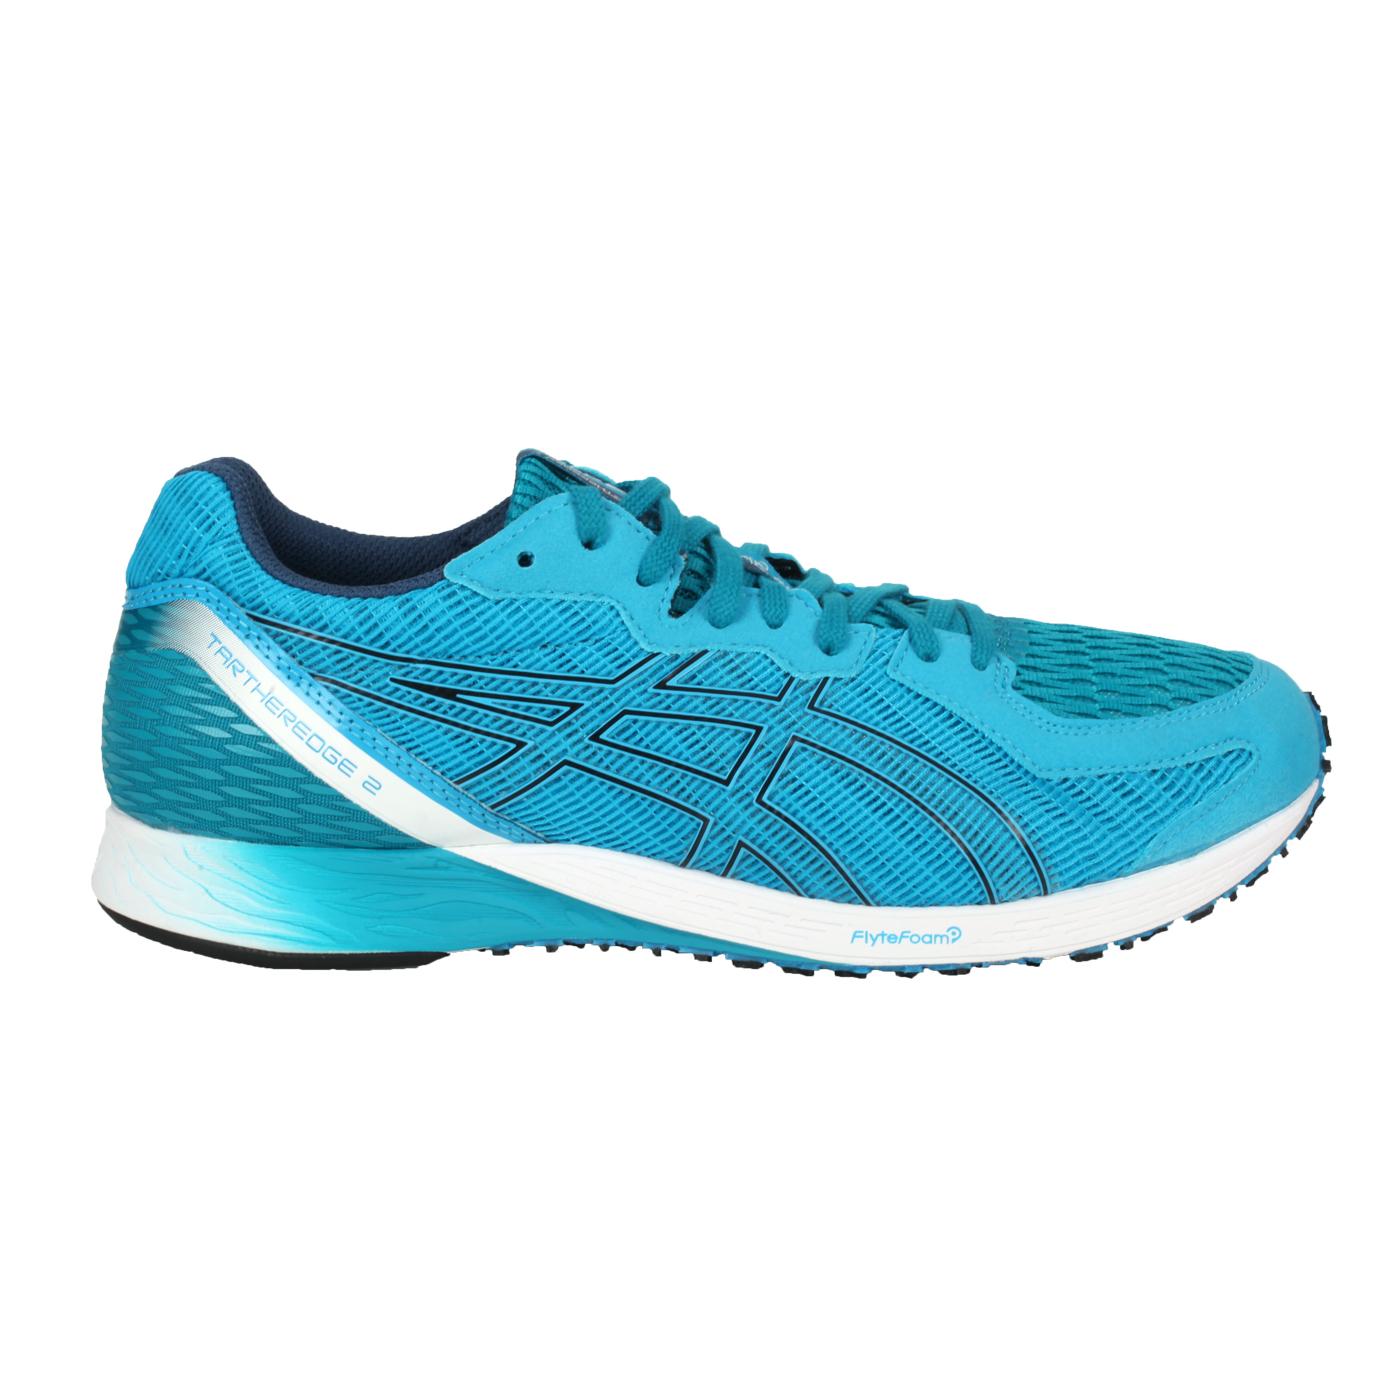 ASICS 男款慢跑鞋-2E  @TARTHEREDGE 2@1011A855-402 - 水藍白